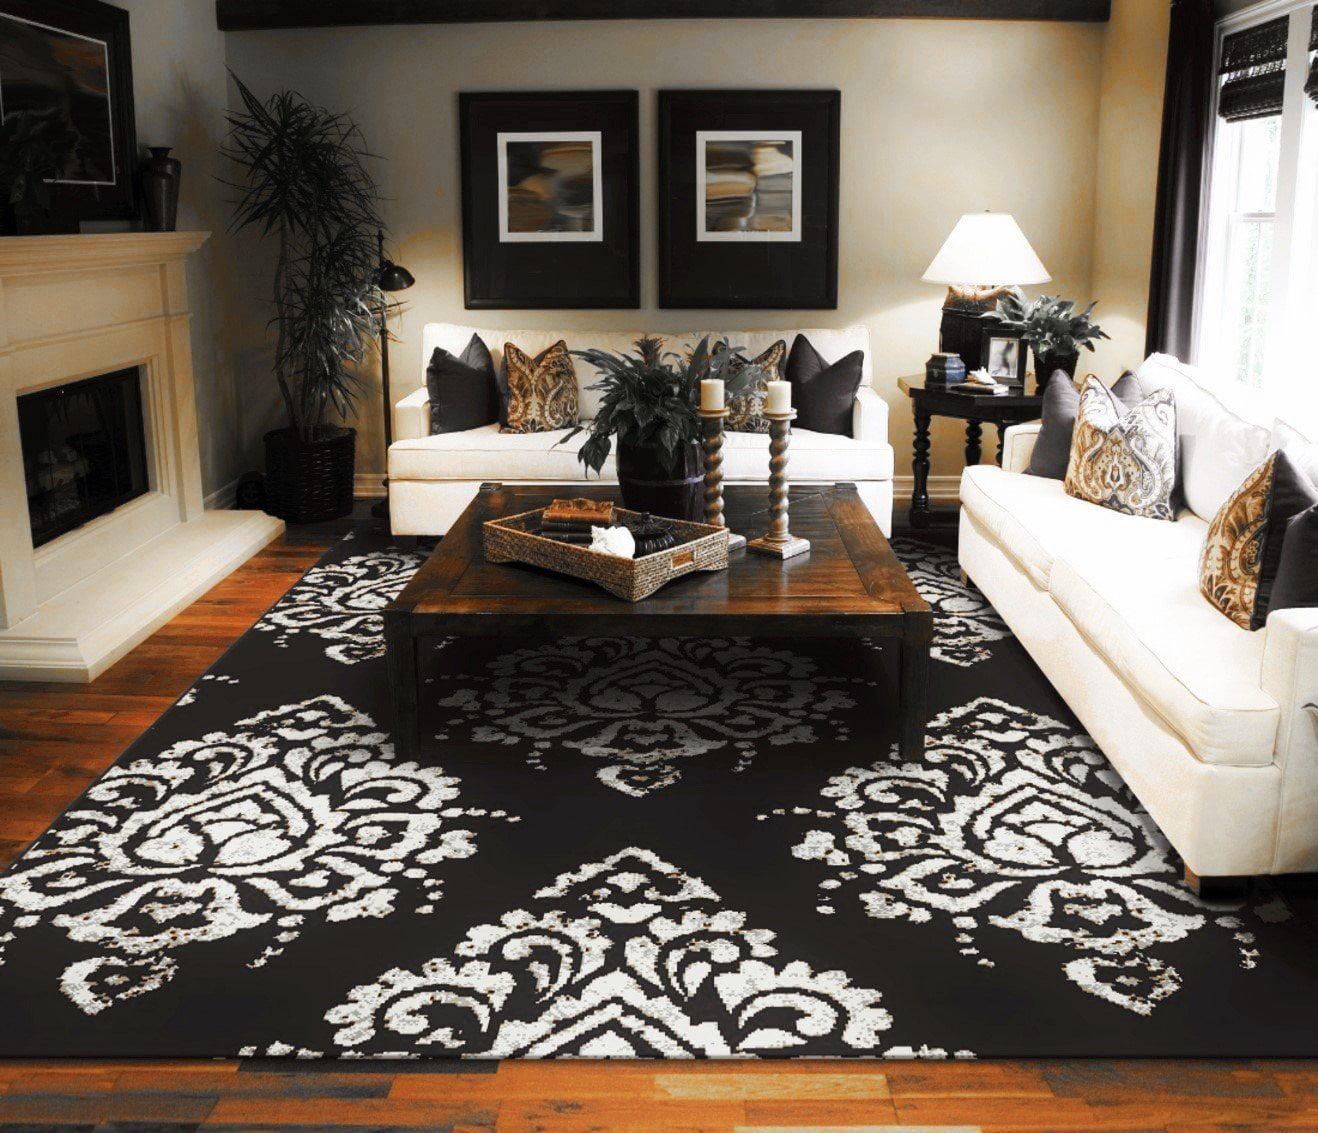 Large Area Rugs For Living Room 8x10 Walmart Com Walmart Com